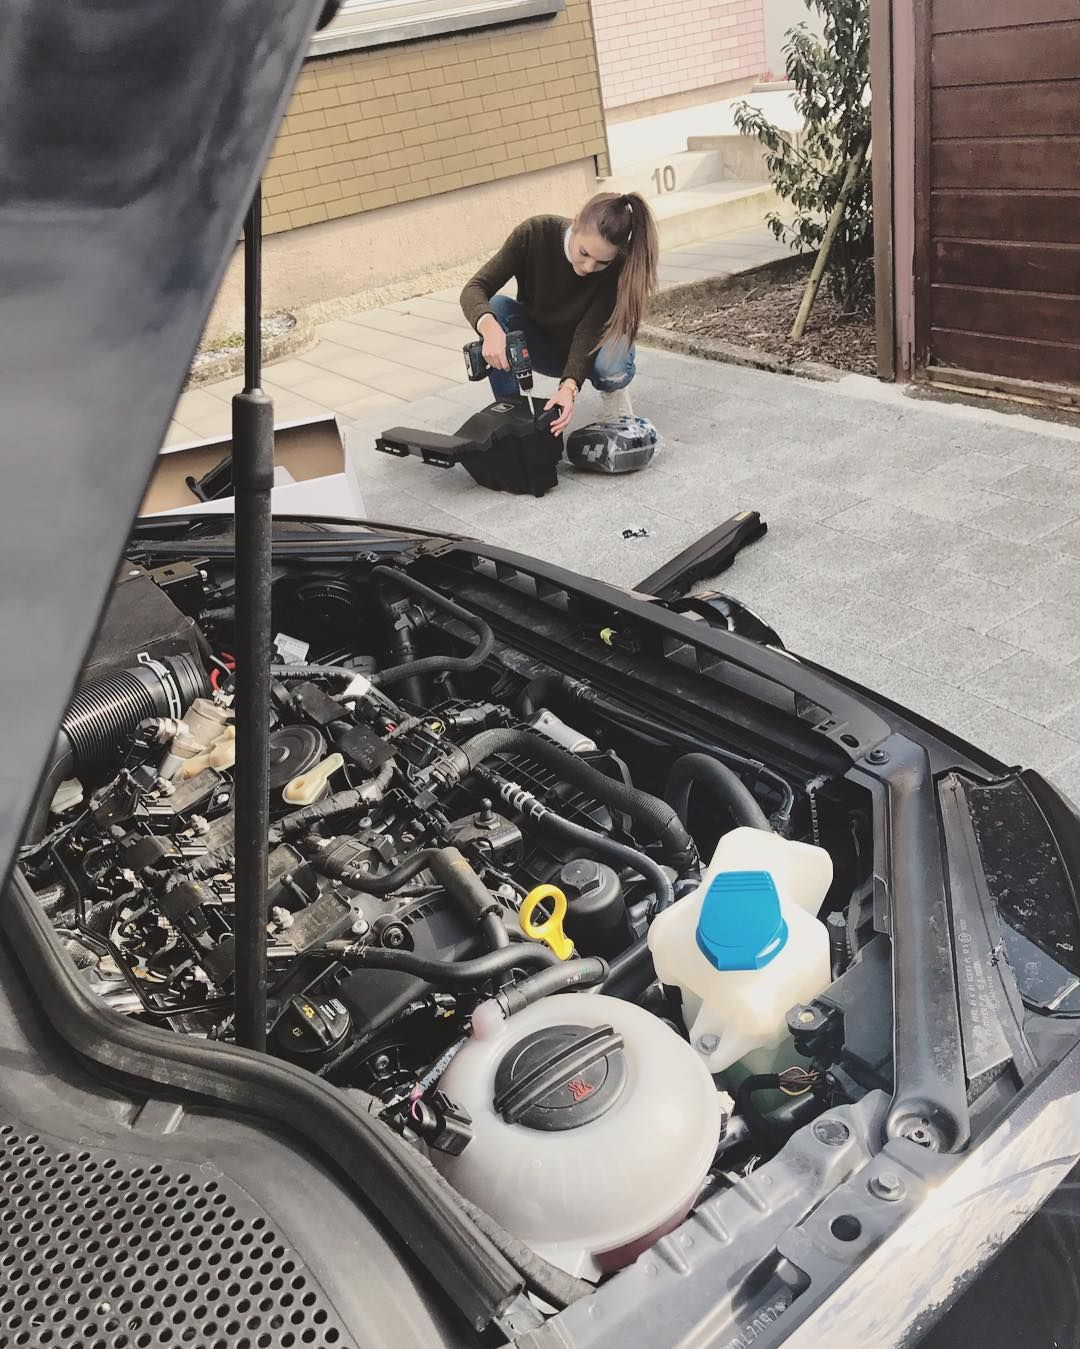 northjersey volkswagen passat engine pin bergencounty autorepair mechanic swap